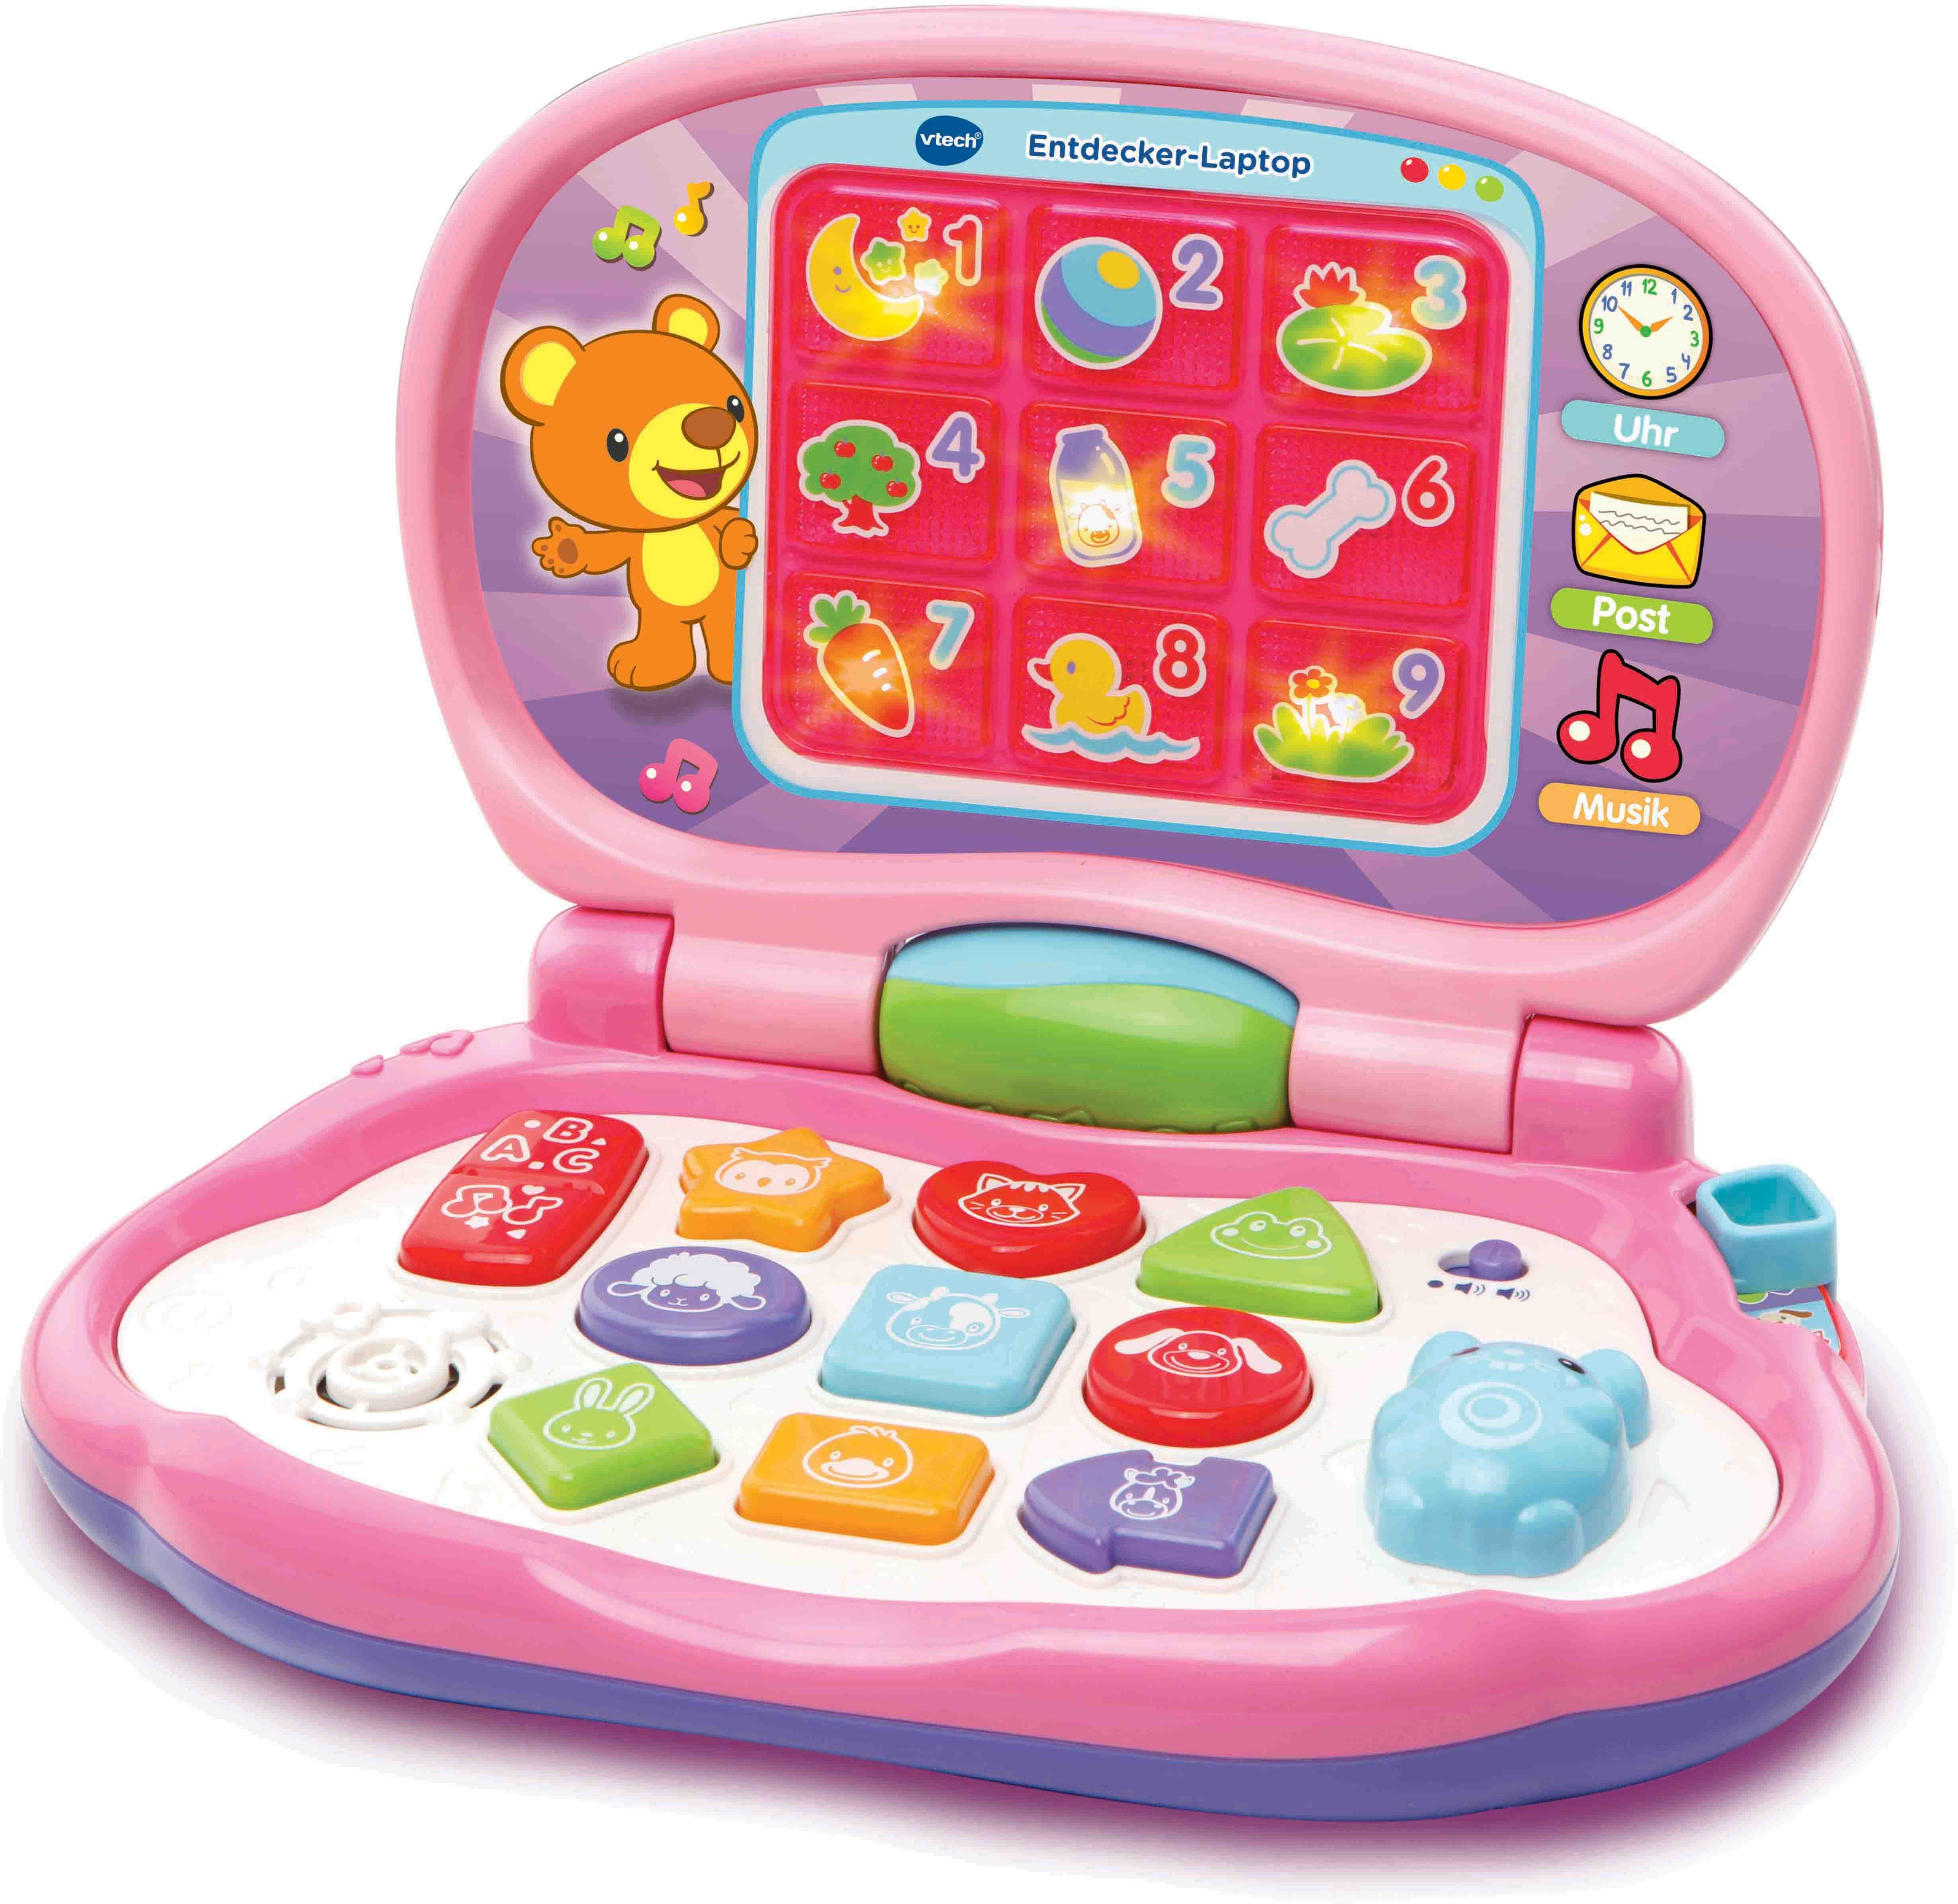 VTech Lernspielzeug, »Entdecker Laptop, pink«